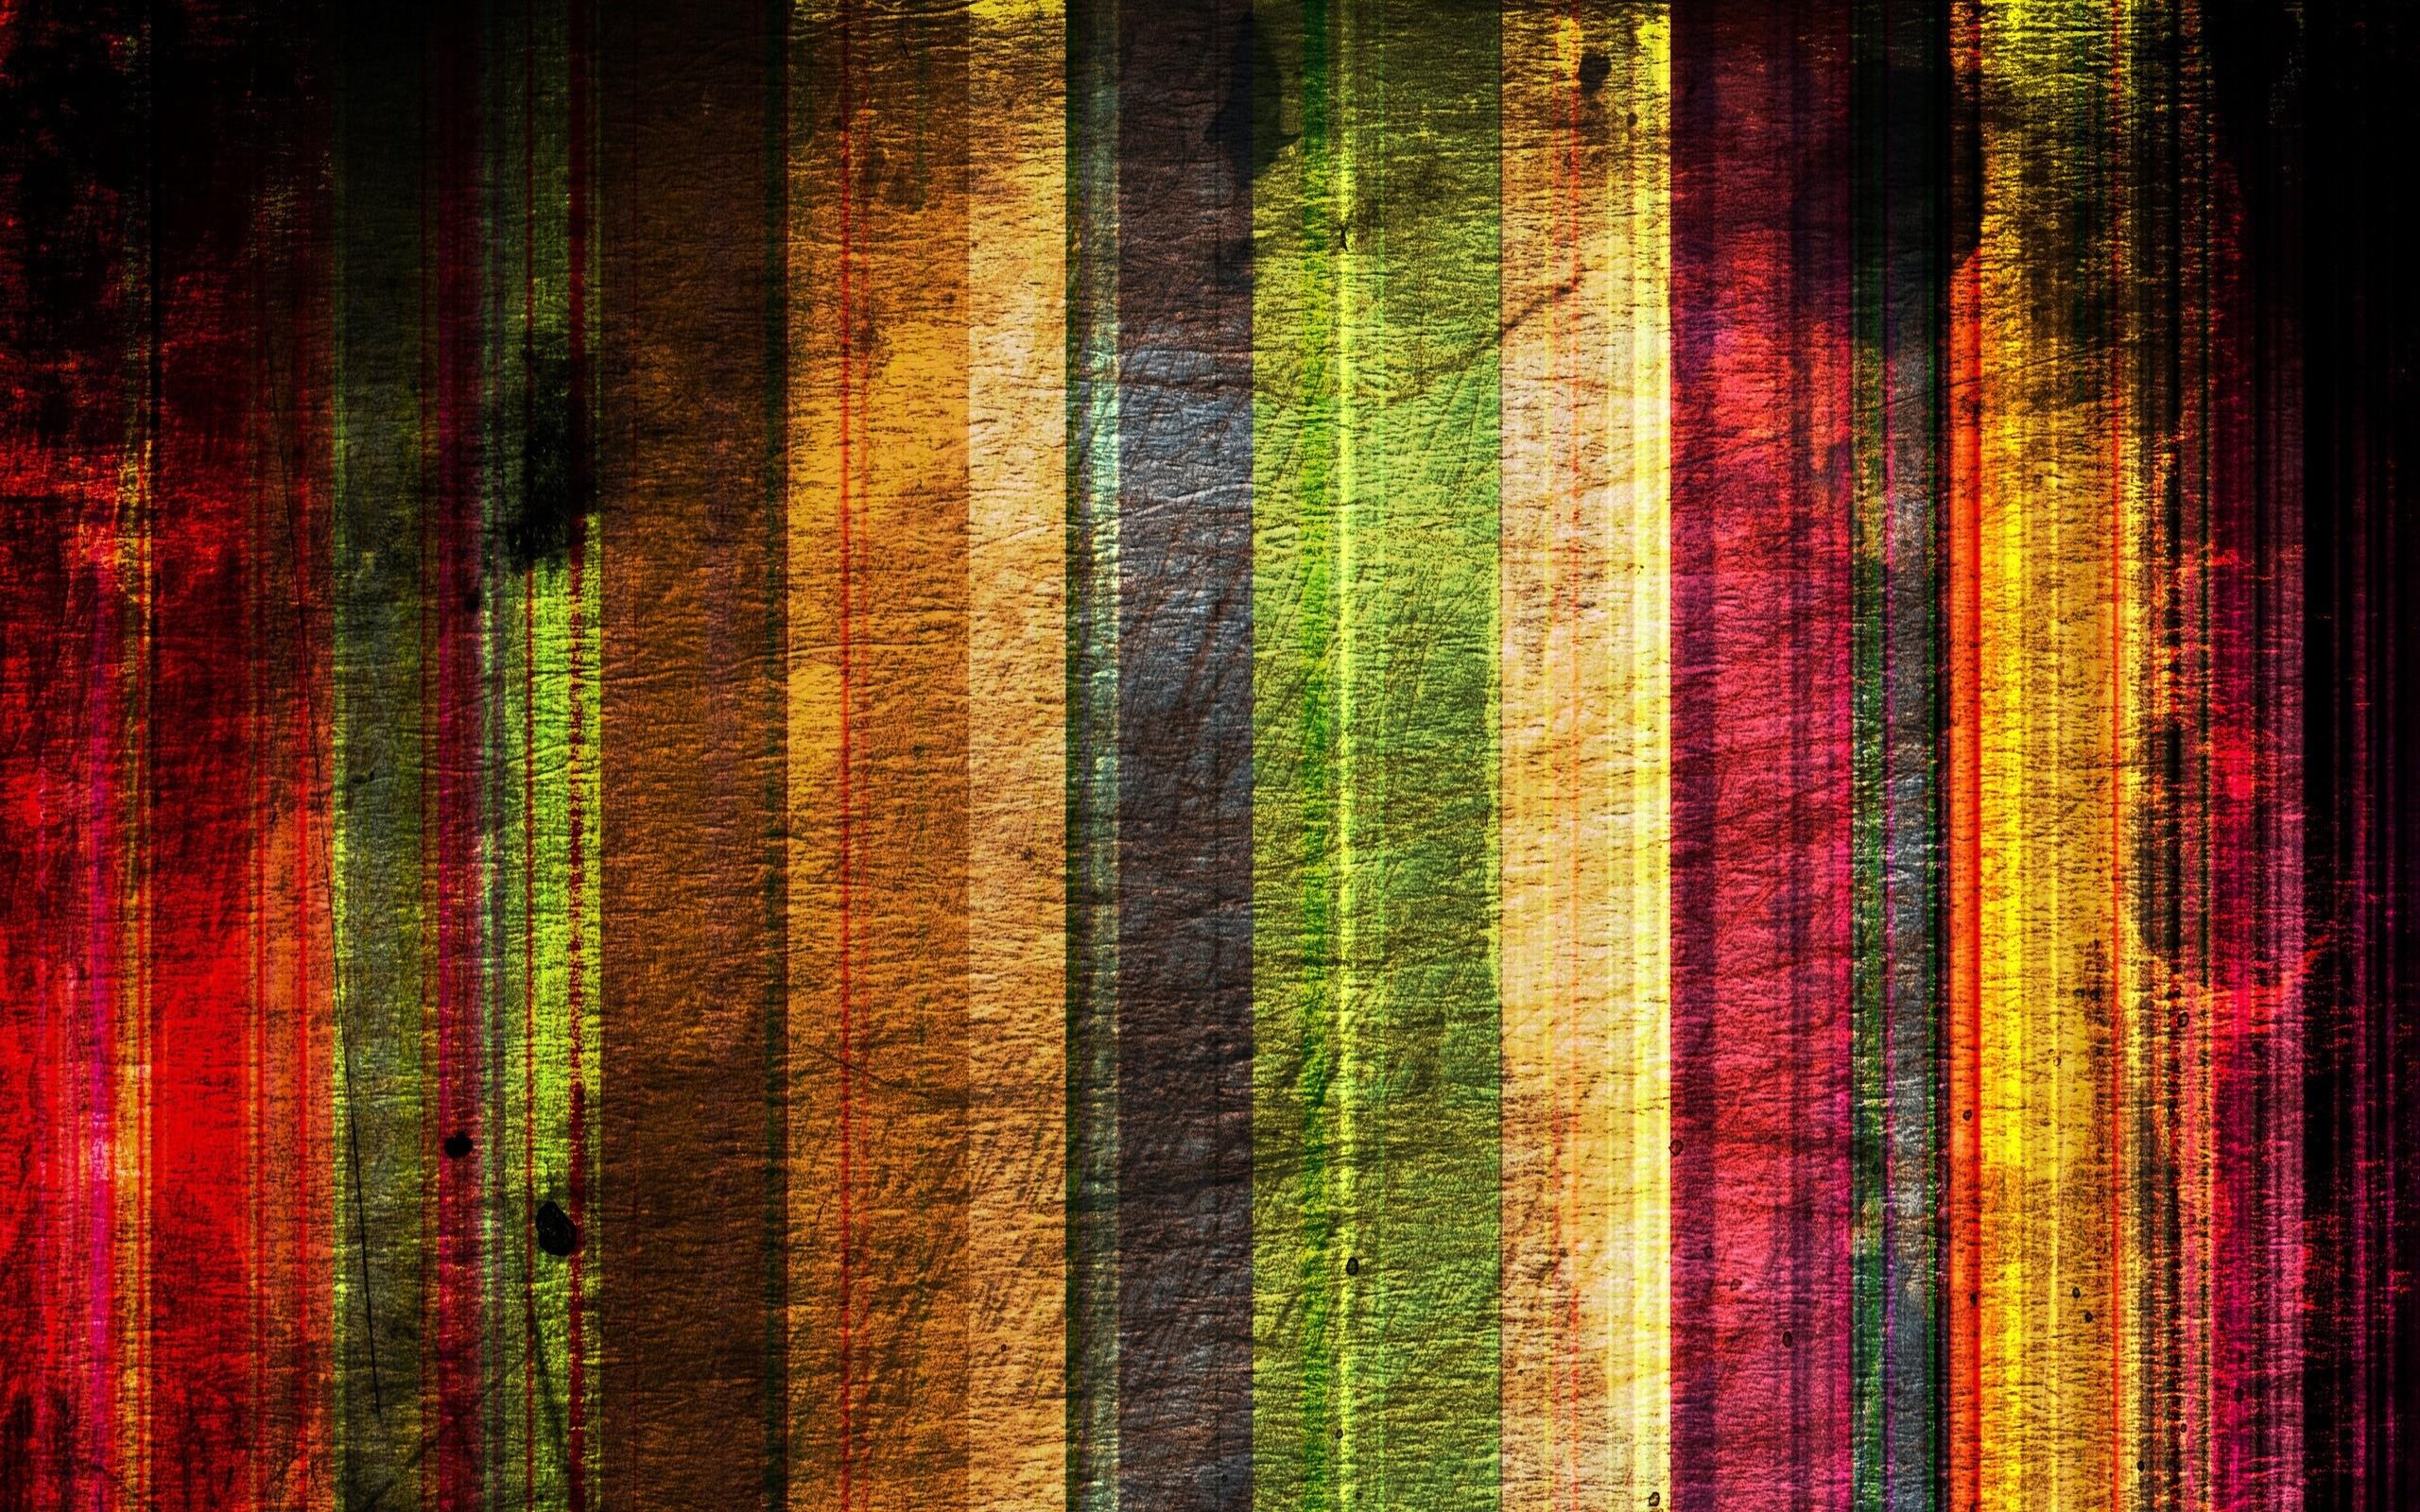 free wallpaper 69 hd - photo #21